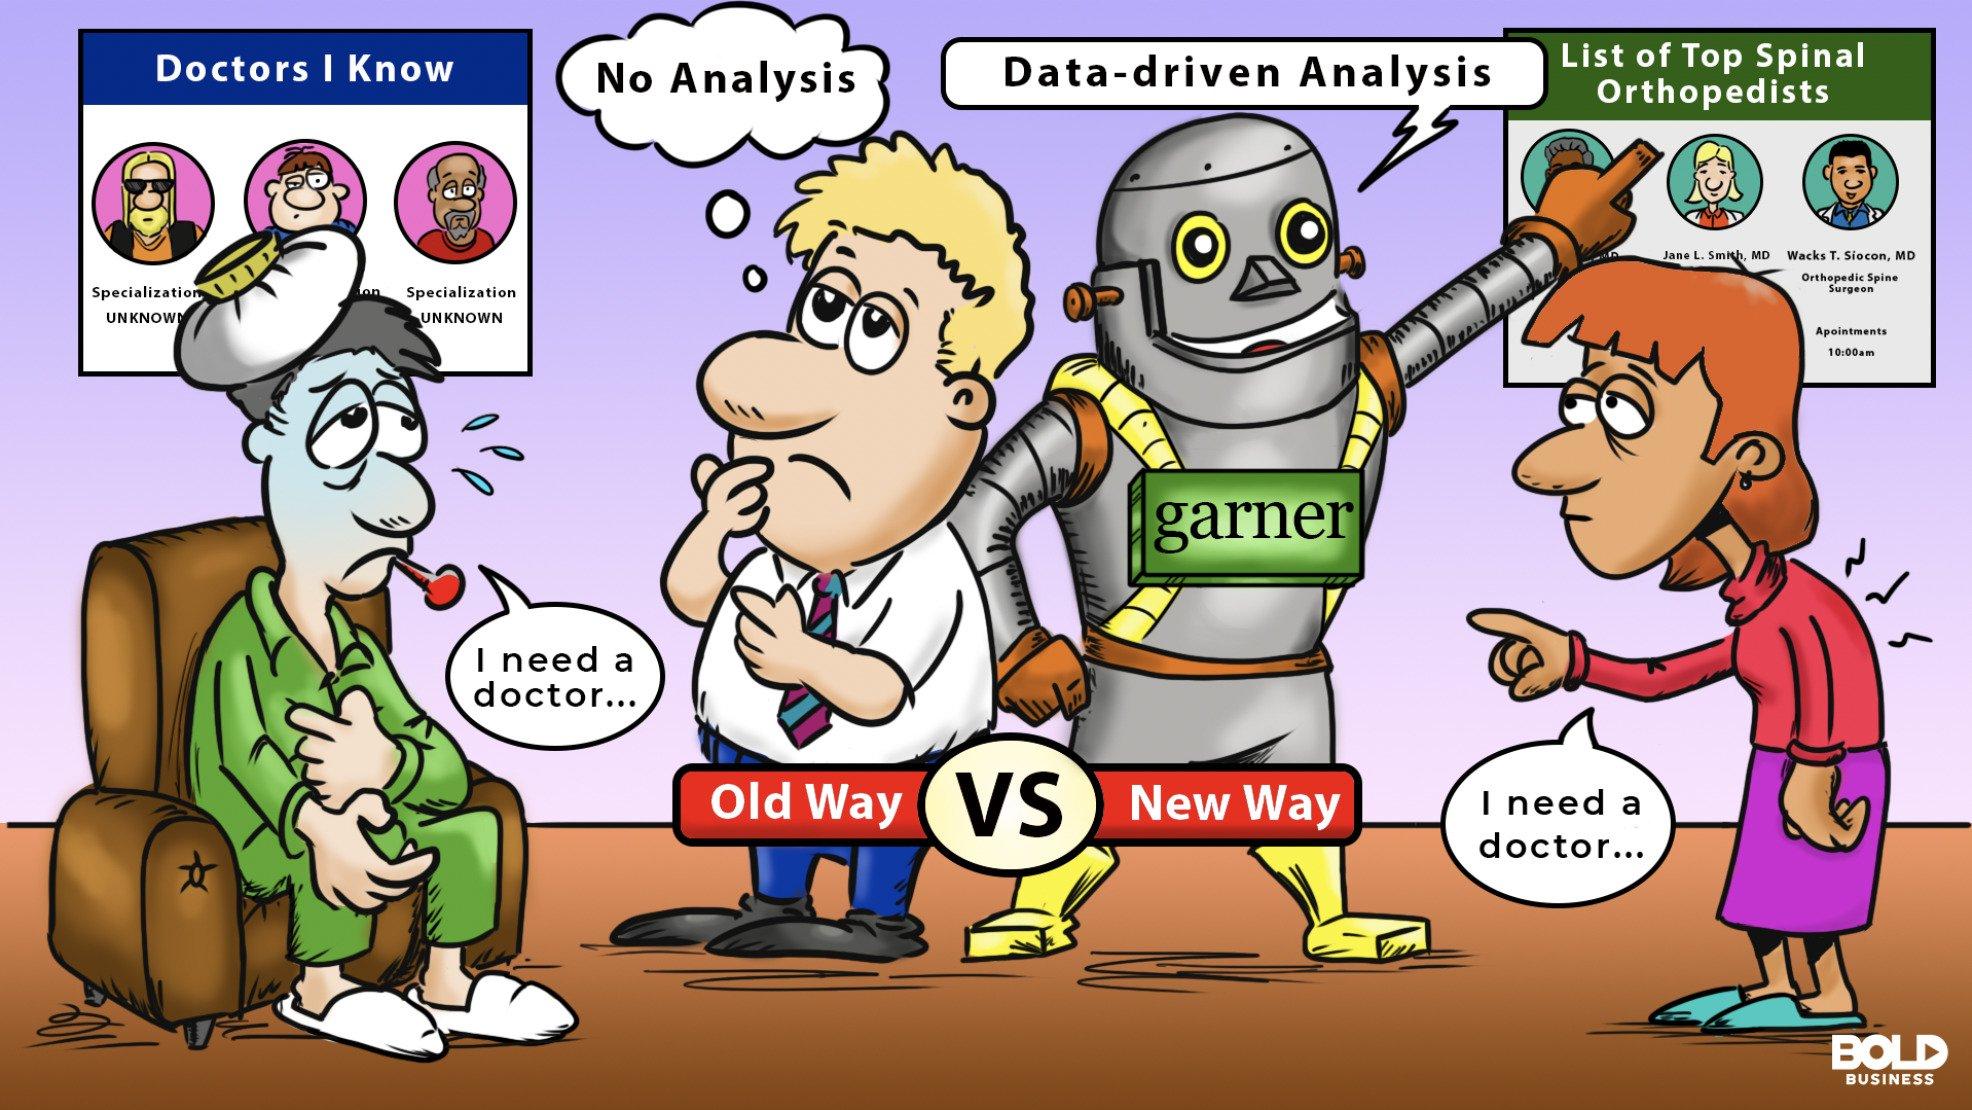 A cartoon of a dude recommending doctors versus a robot doing it